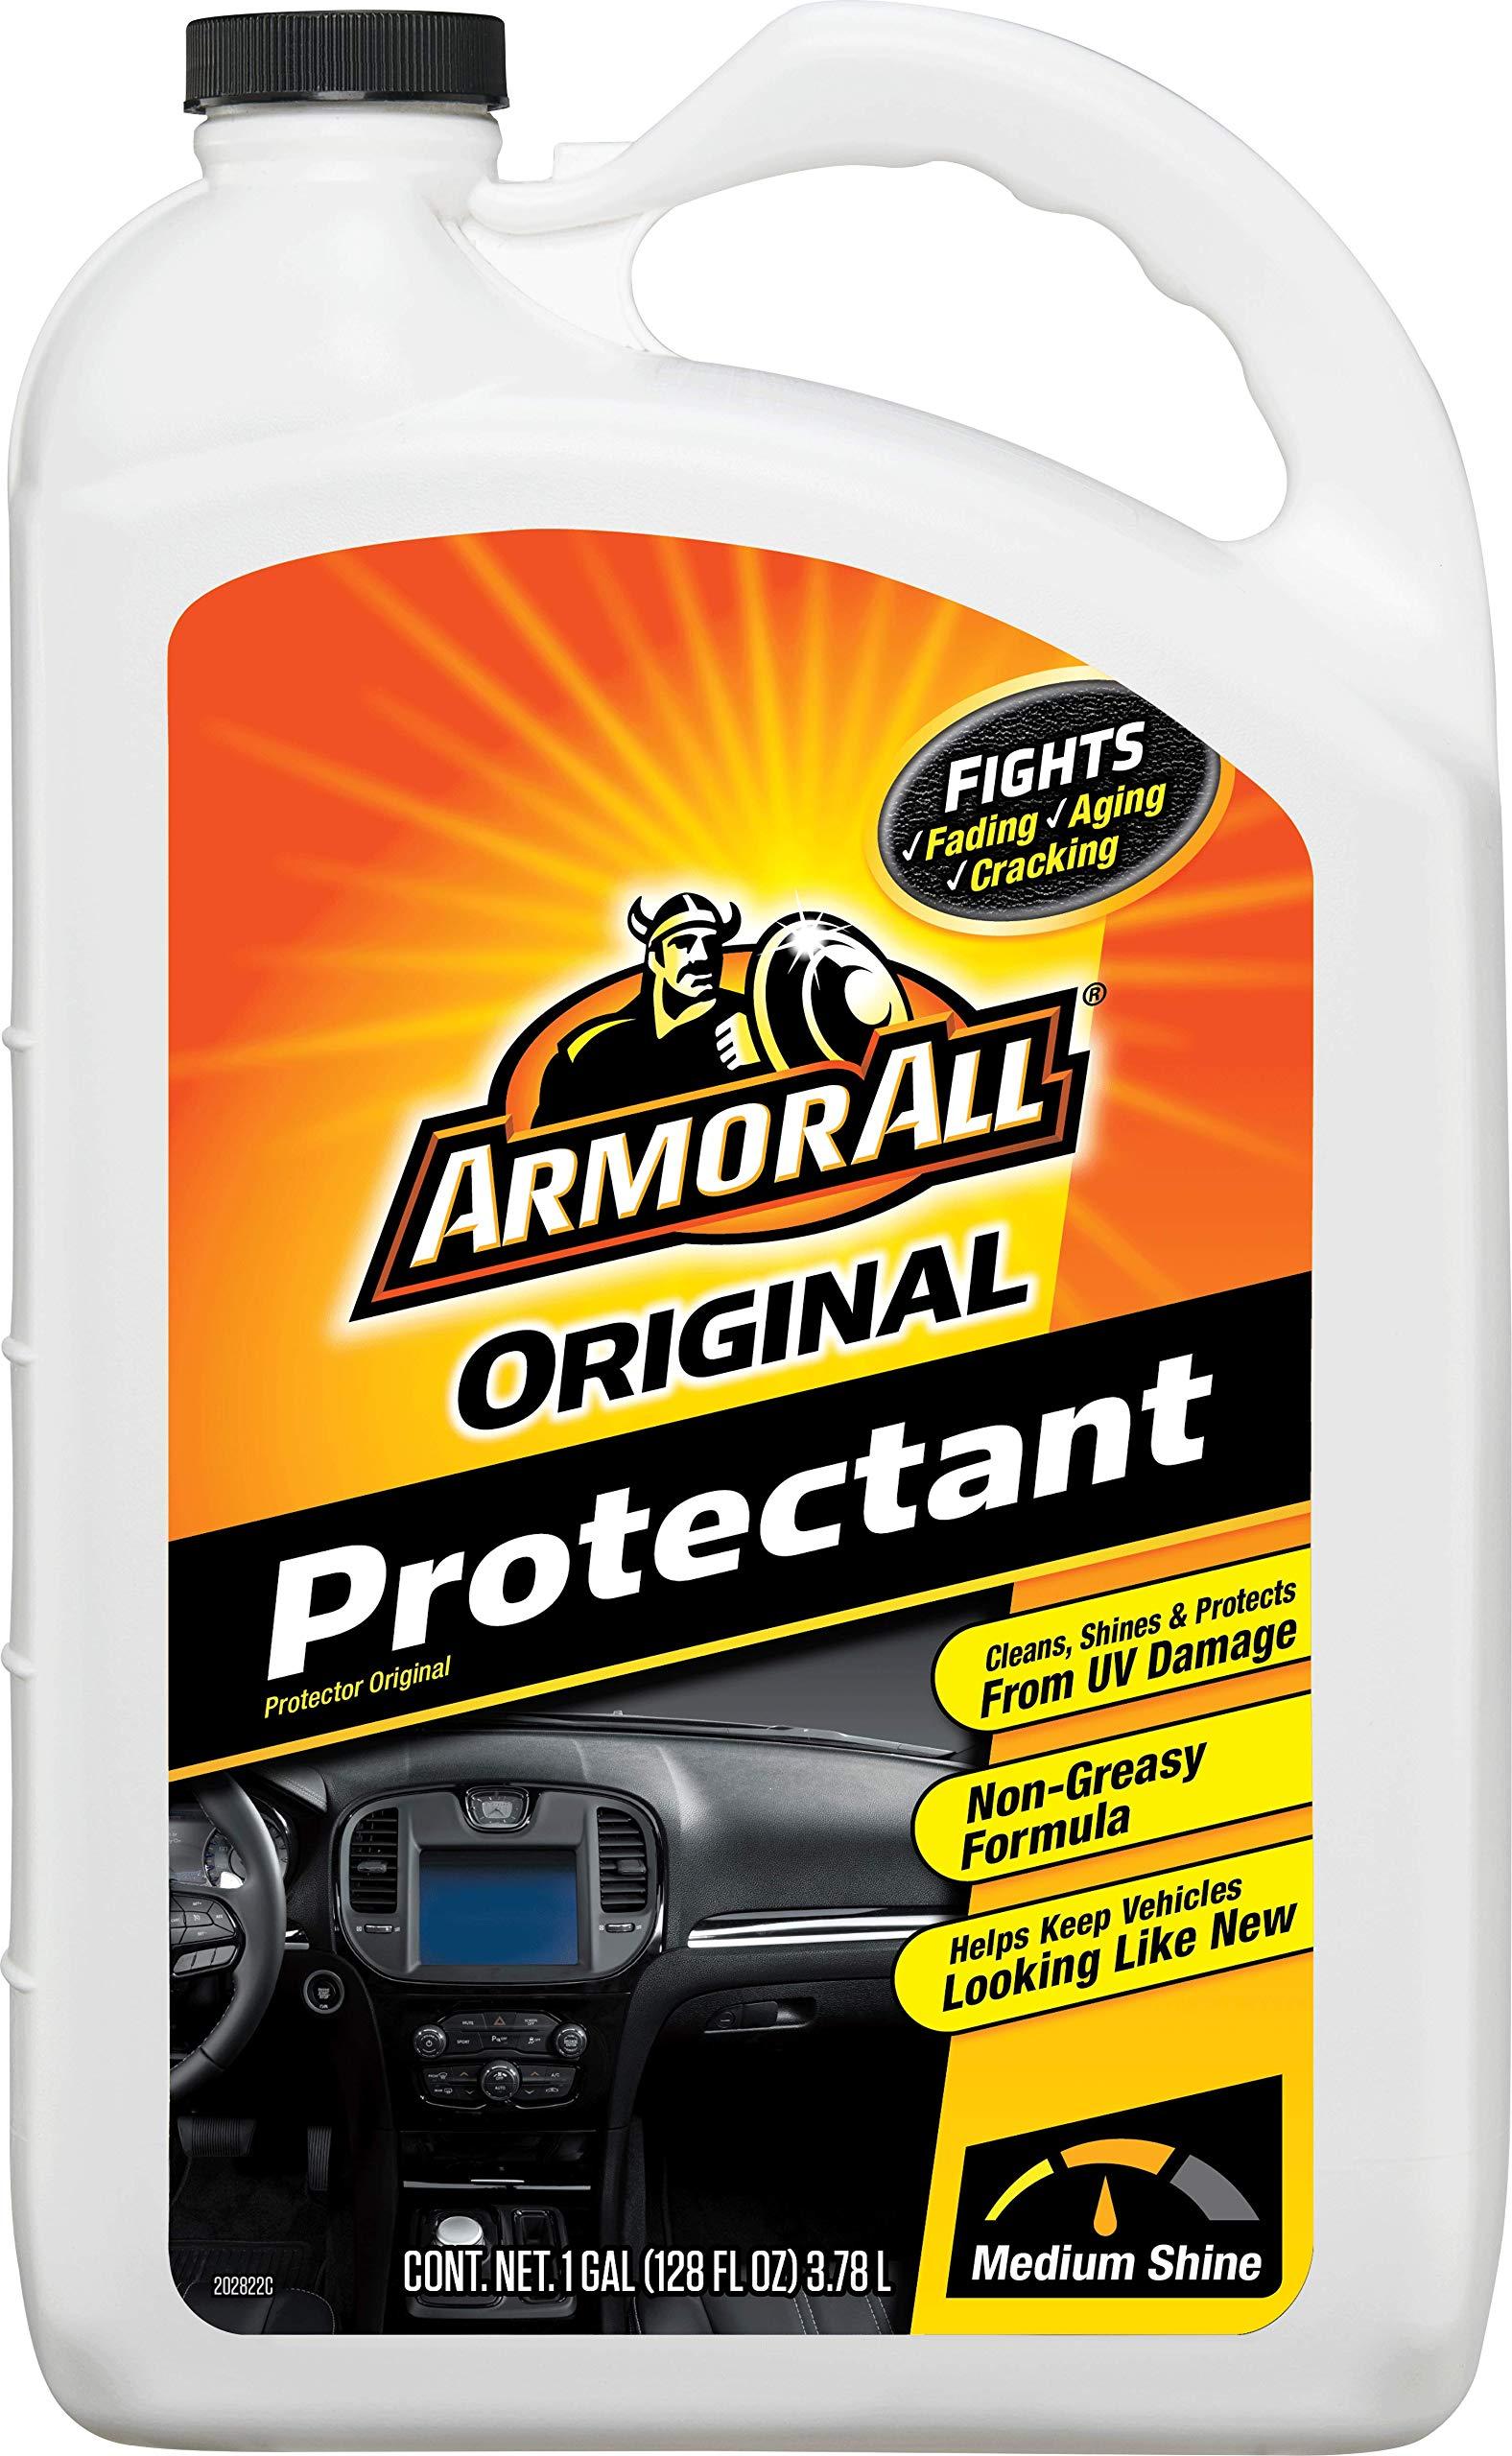 Armor All Original Protectant Refill (1 gallon) (Case of 4)